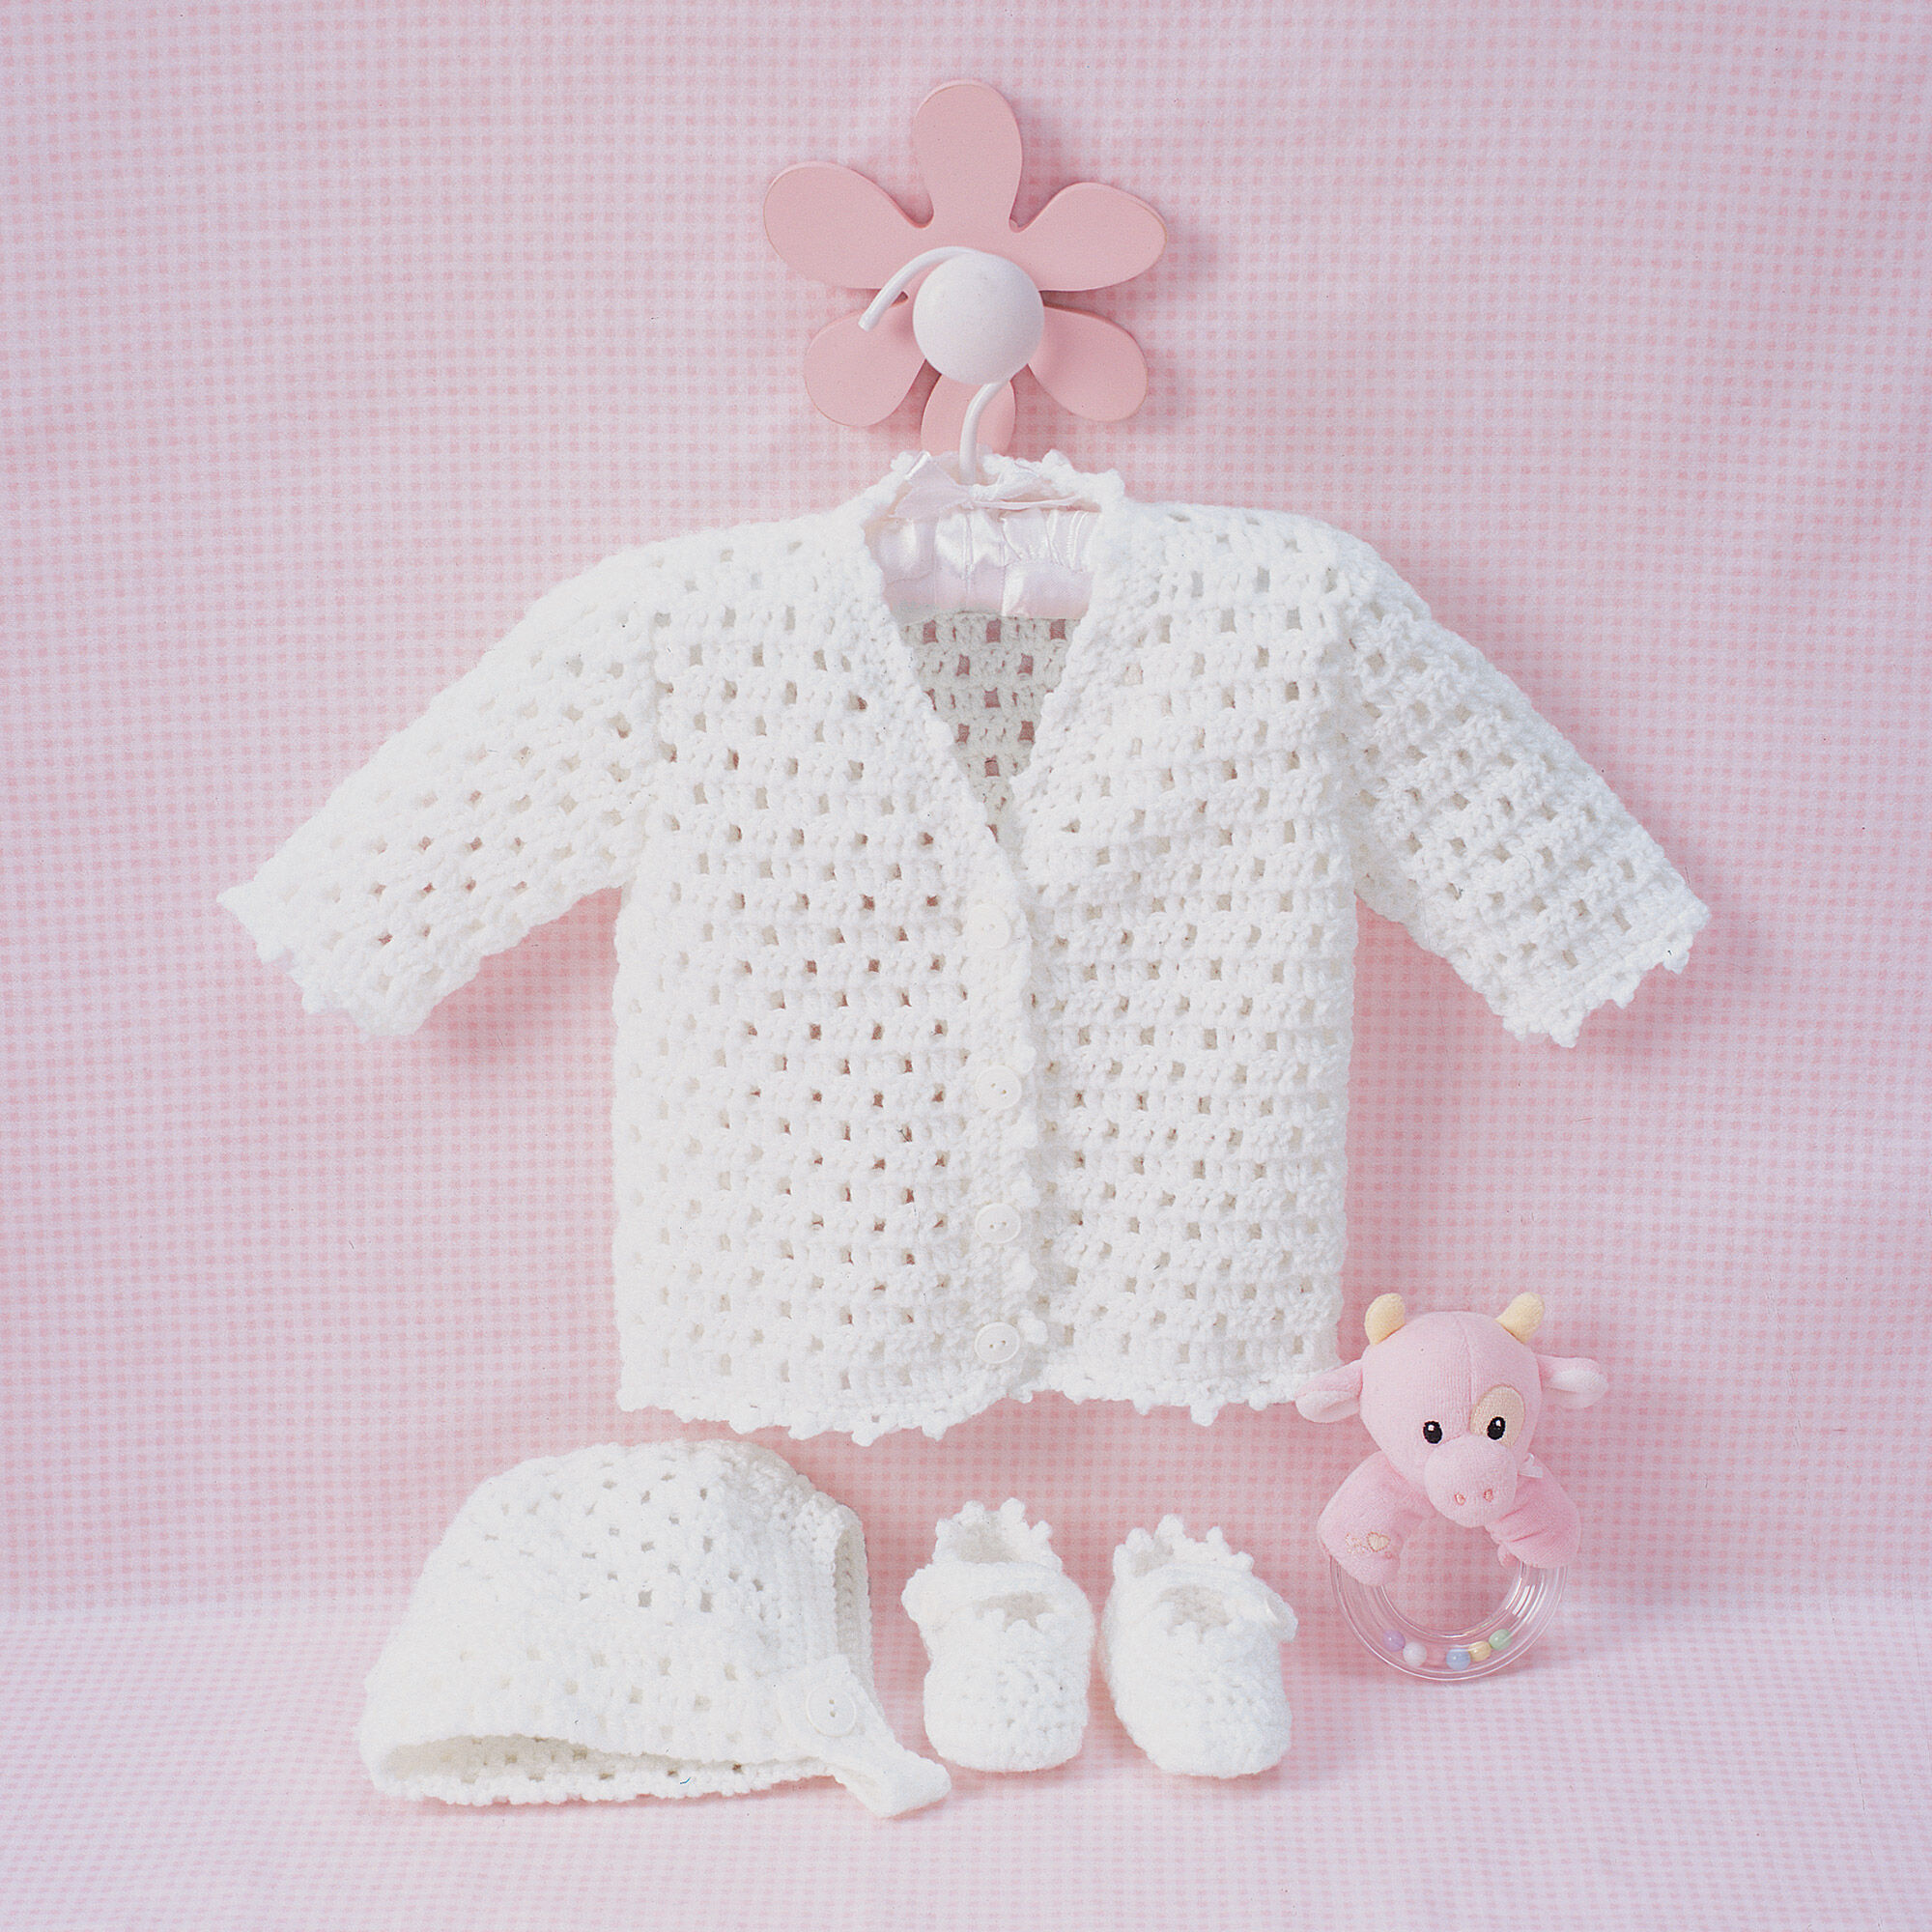 Bernat Lacy Set To Crochet Bonnet Yarnspirations